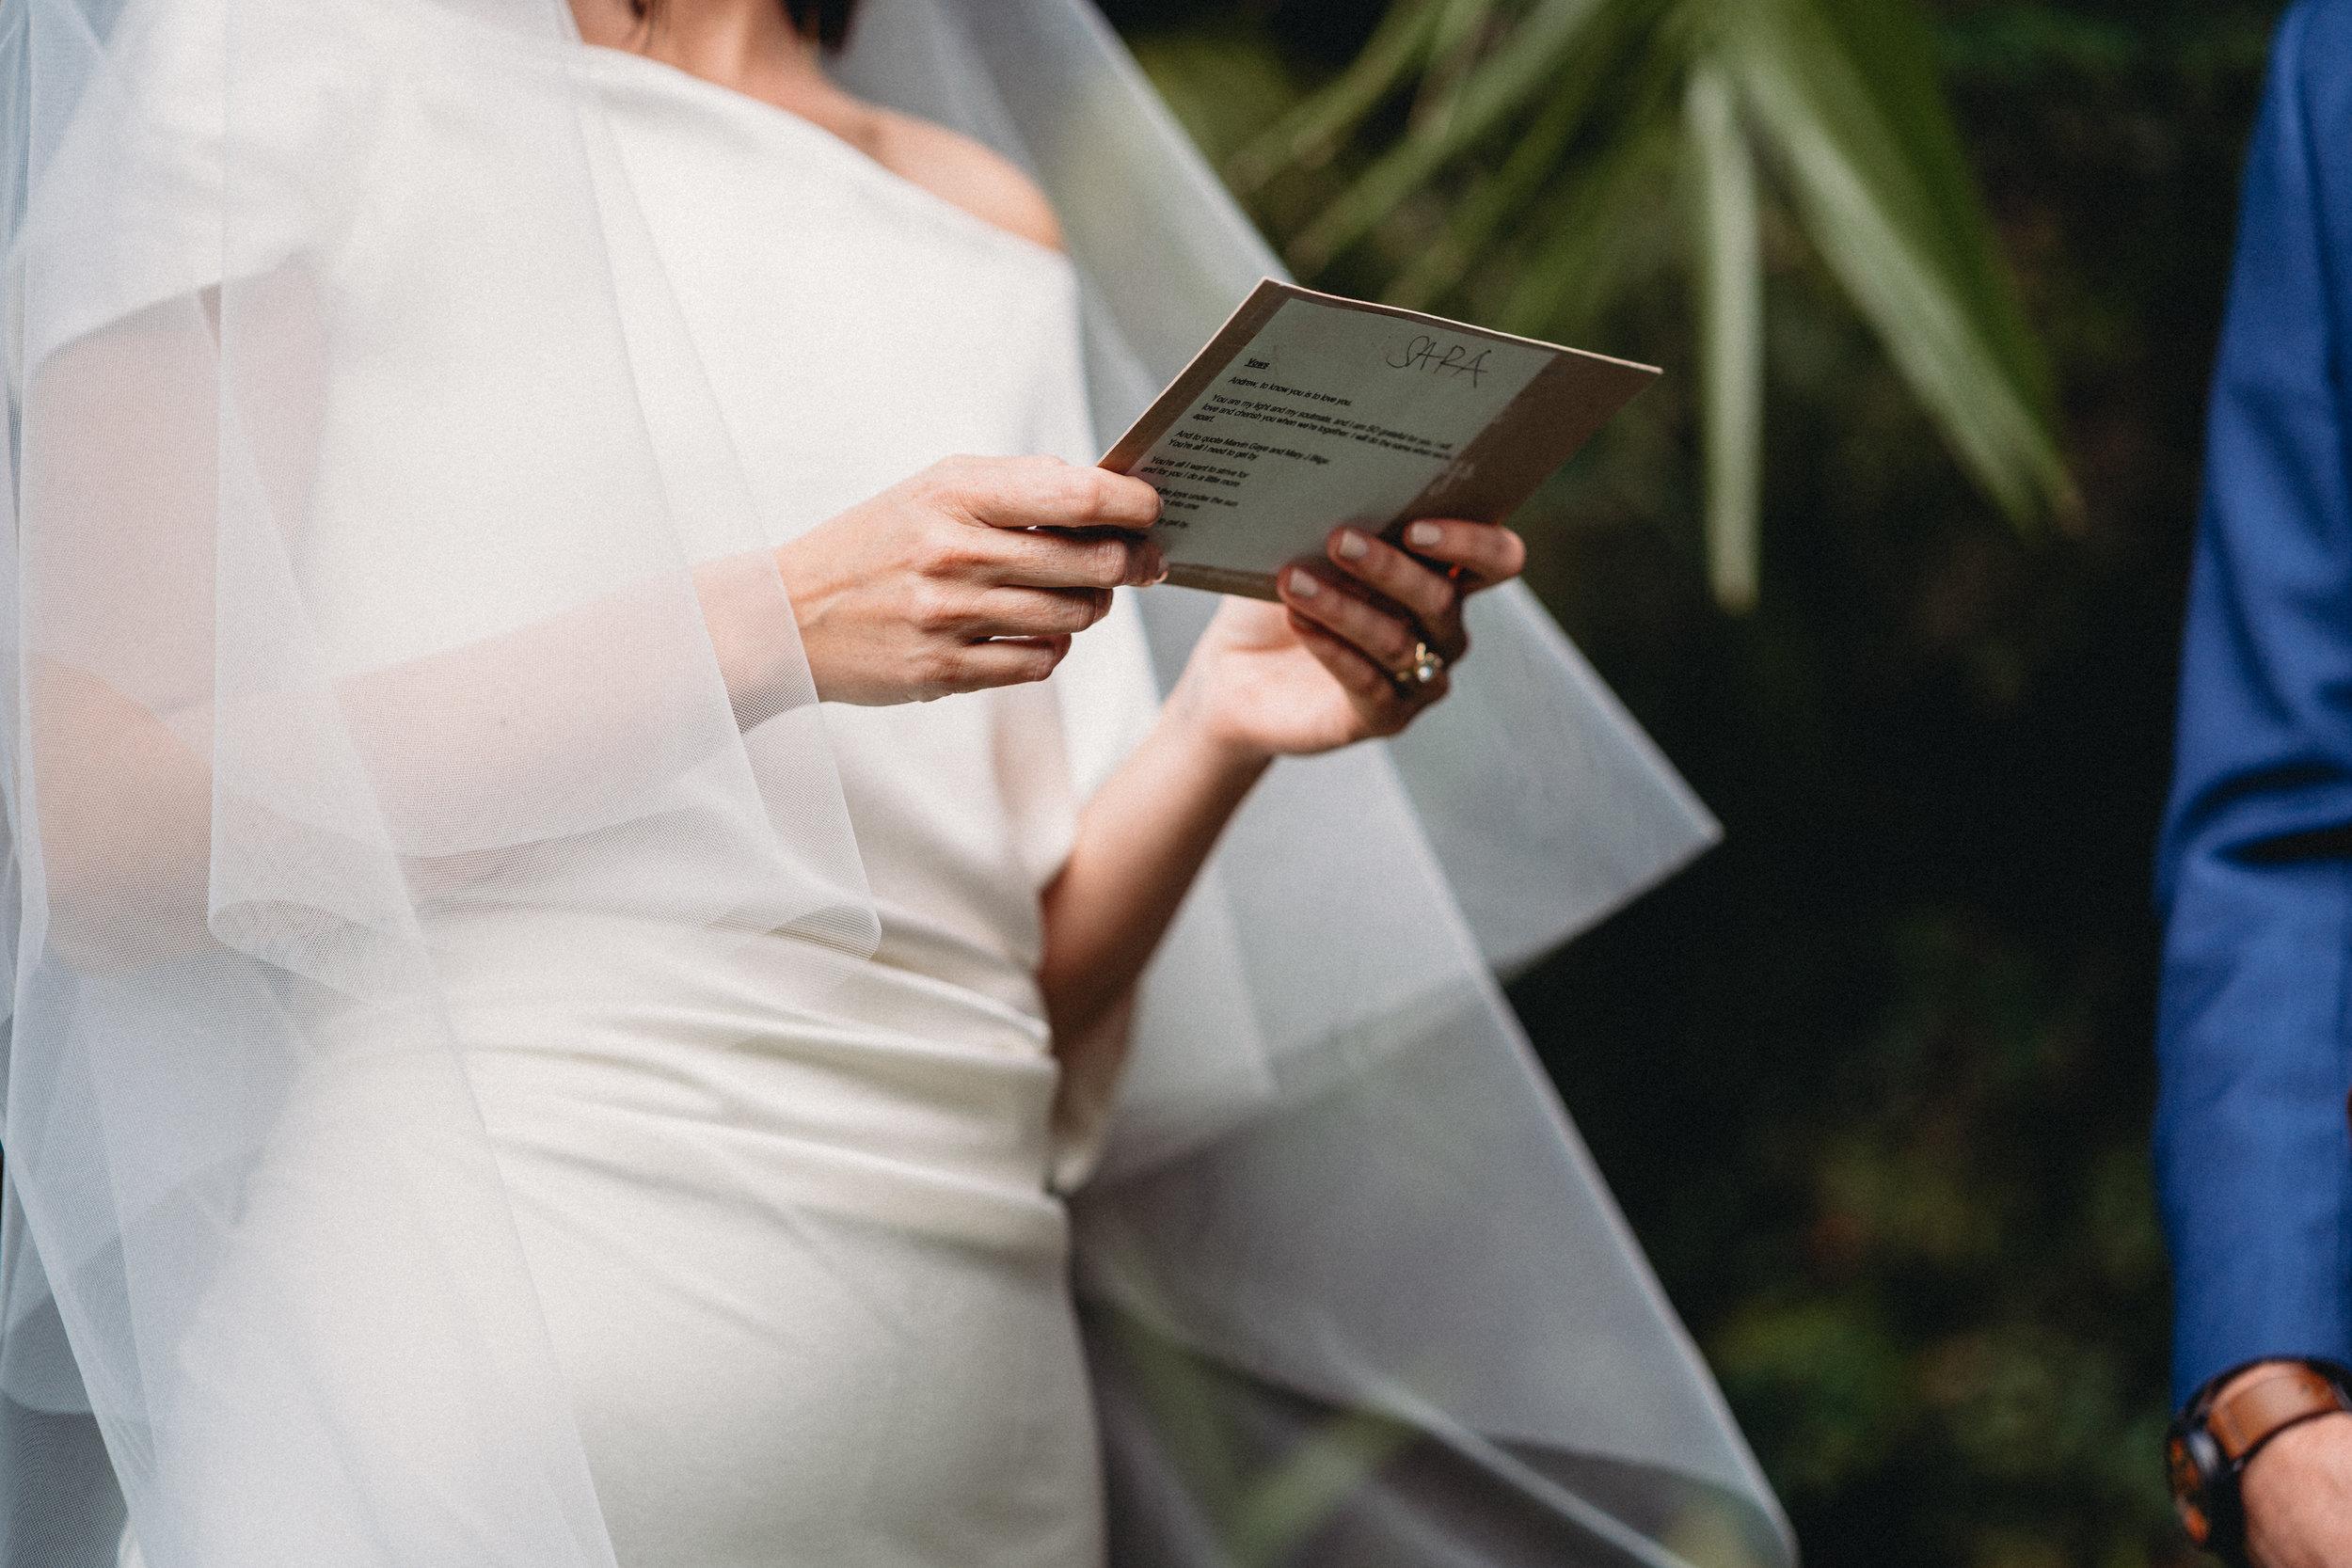 wedding-photography-santa-barbara-courthouse-rebeccaylasotras-81.jpg